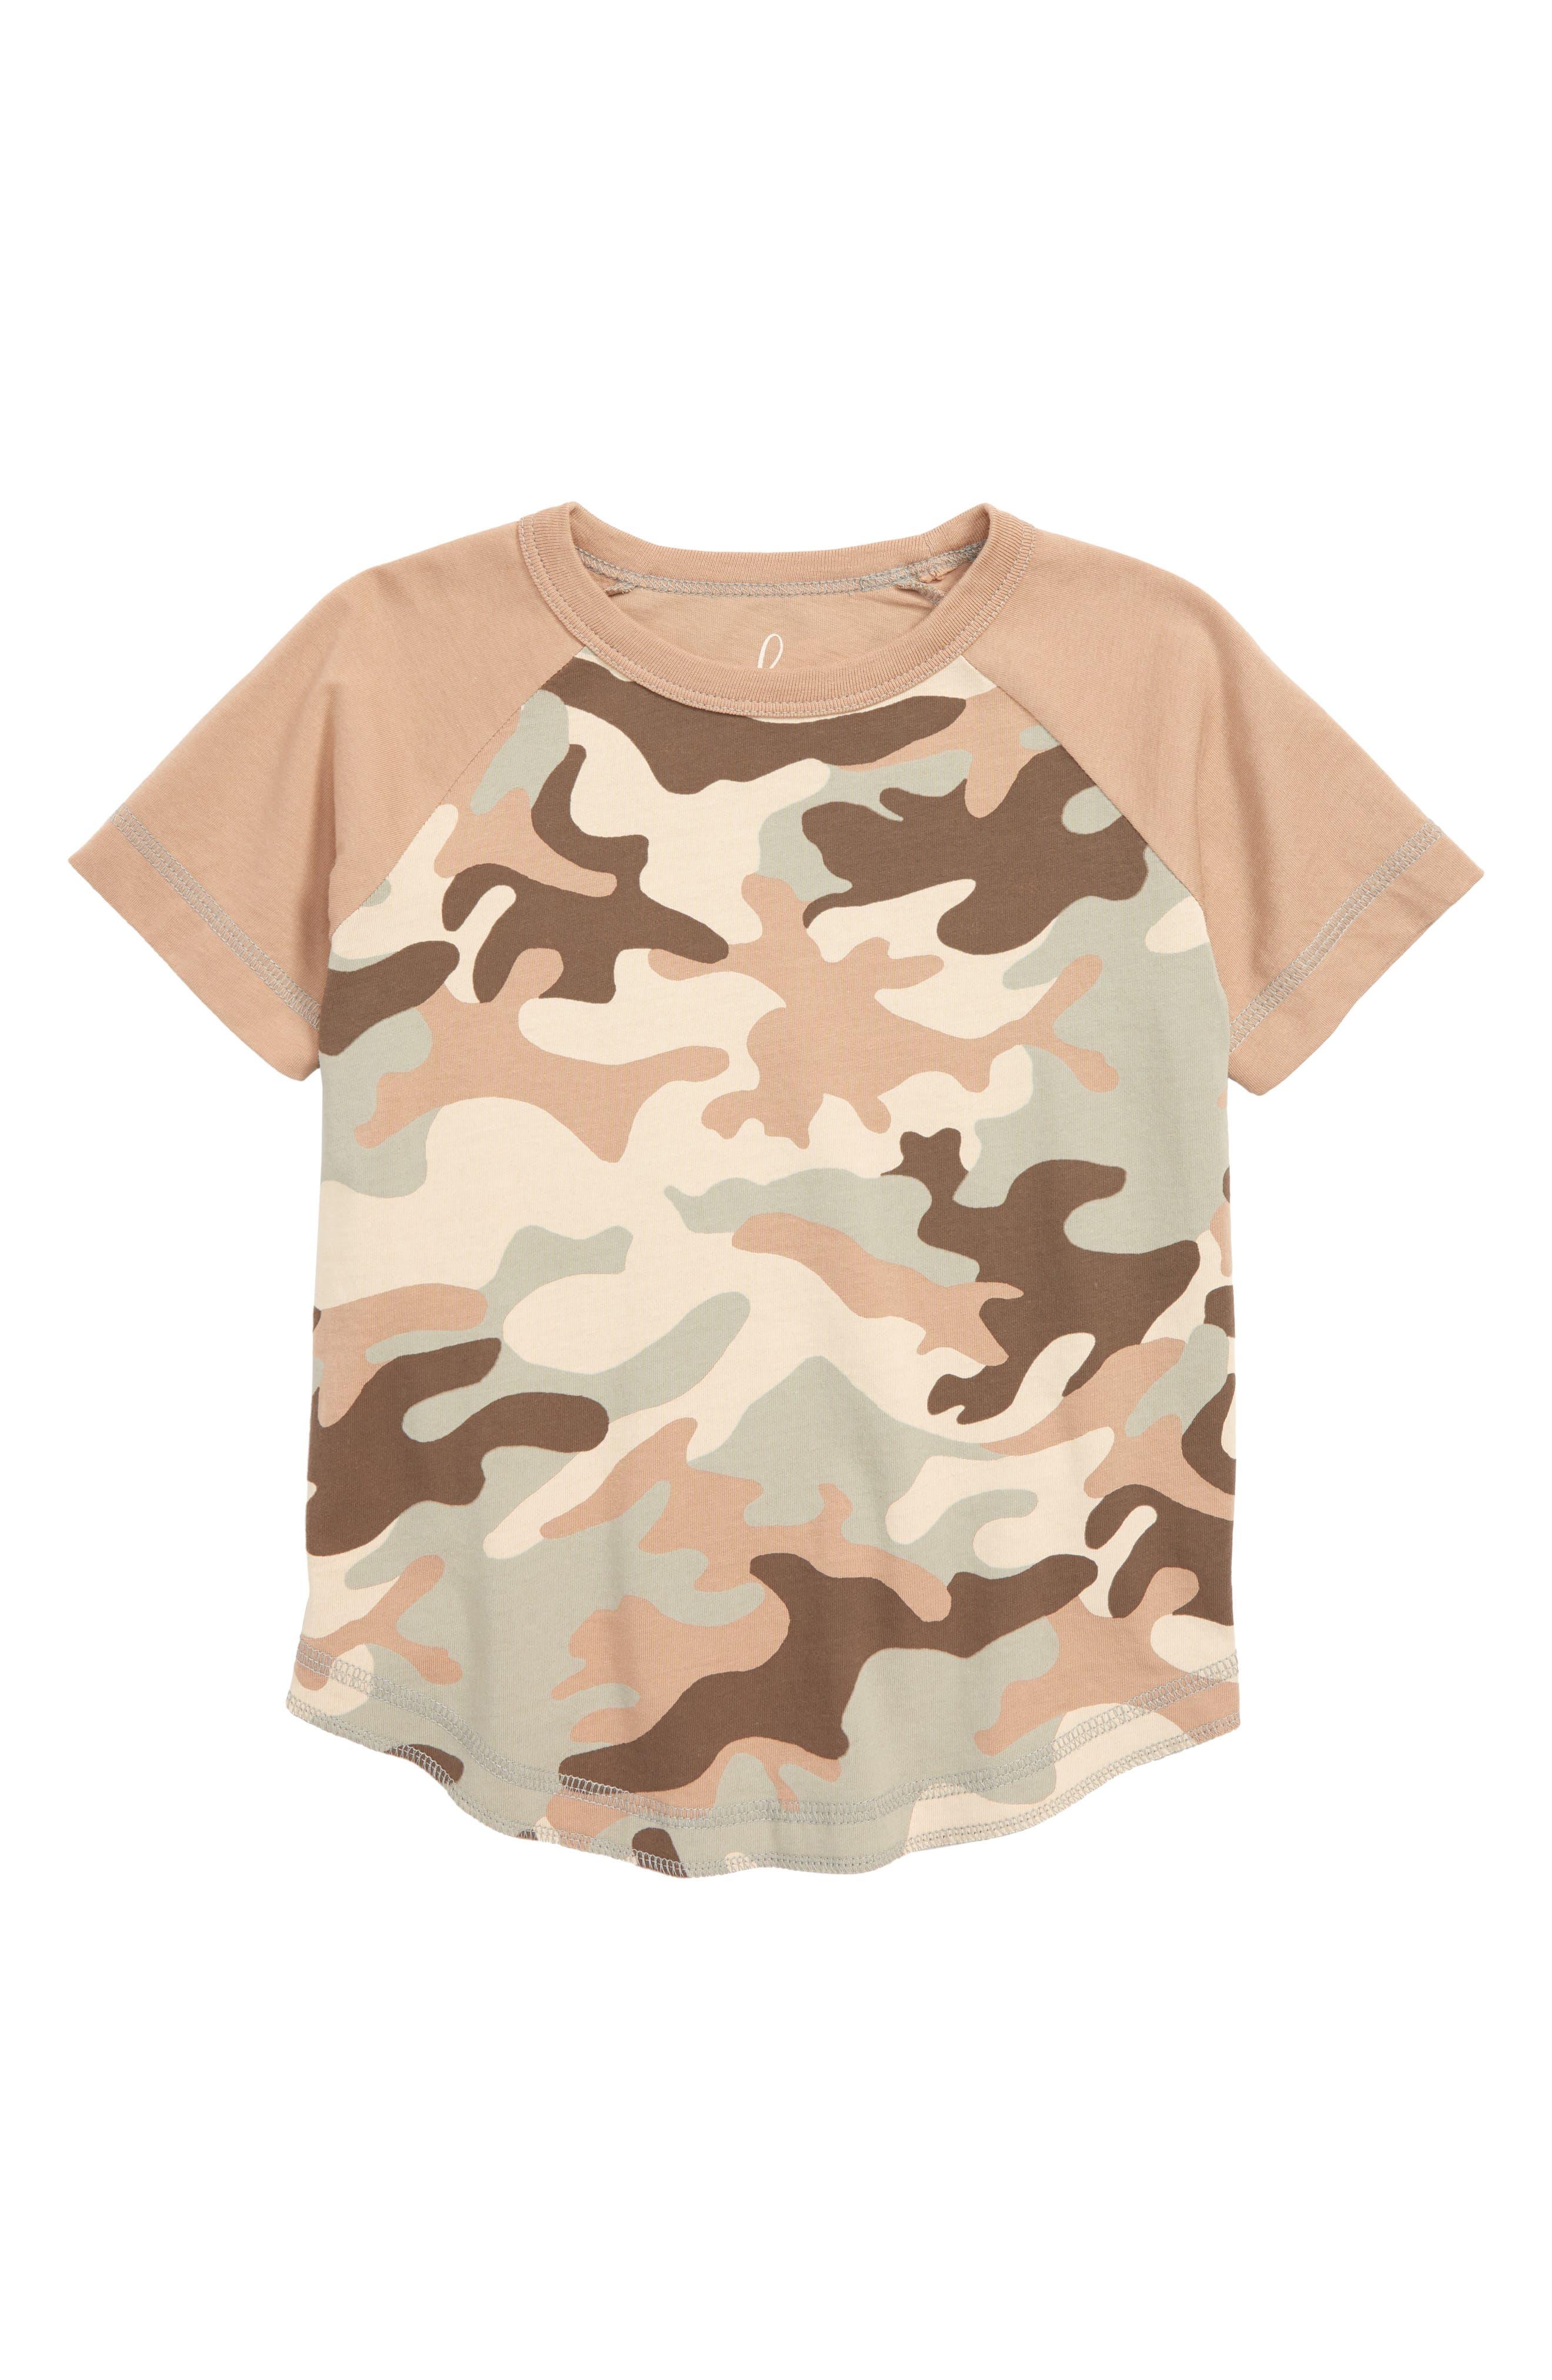 PEEK AREN'T YOU CURIOUS Peek Camo T-Shirt, Main, color, 250